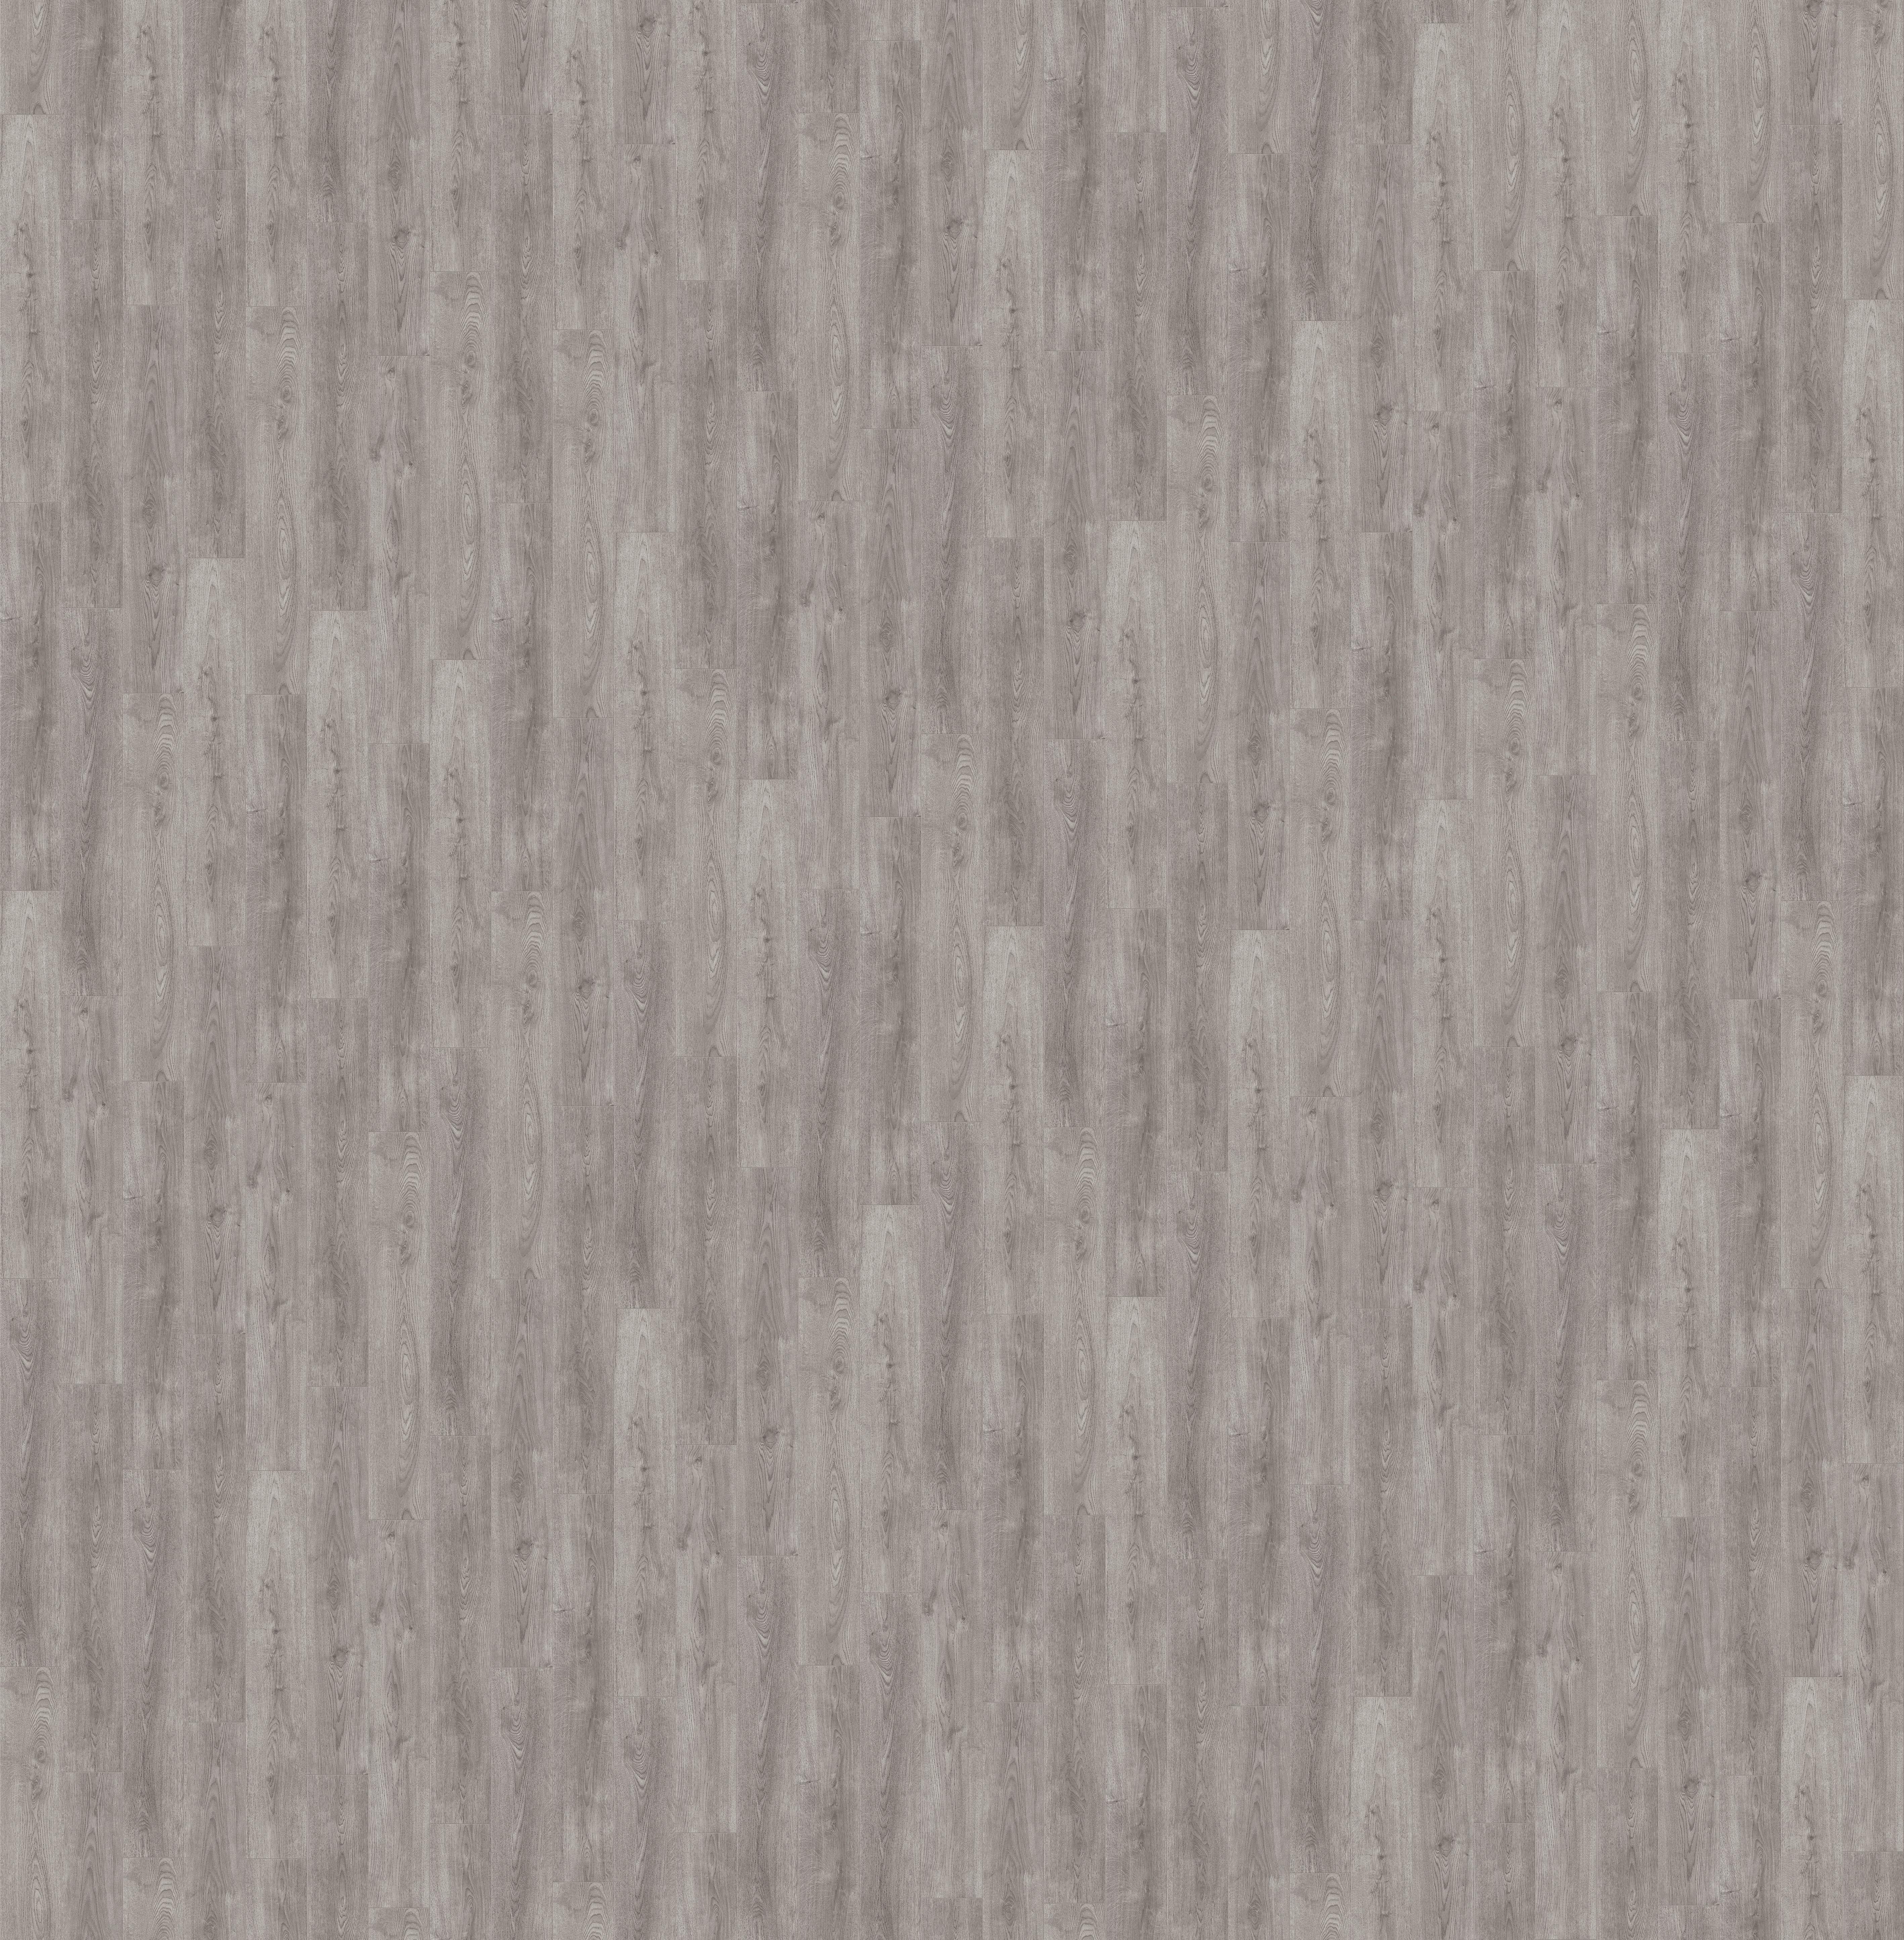 L0607 04386 Vineyard Oak Plank Pro Pergo Co Uk